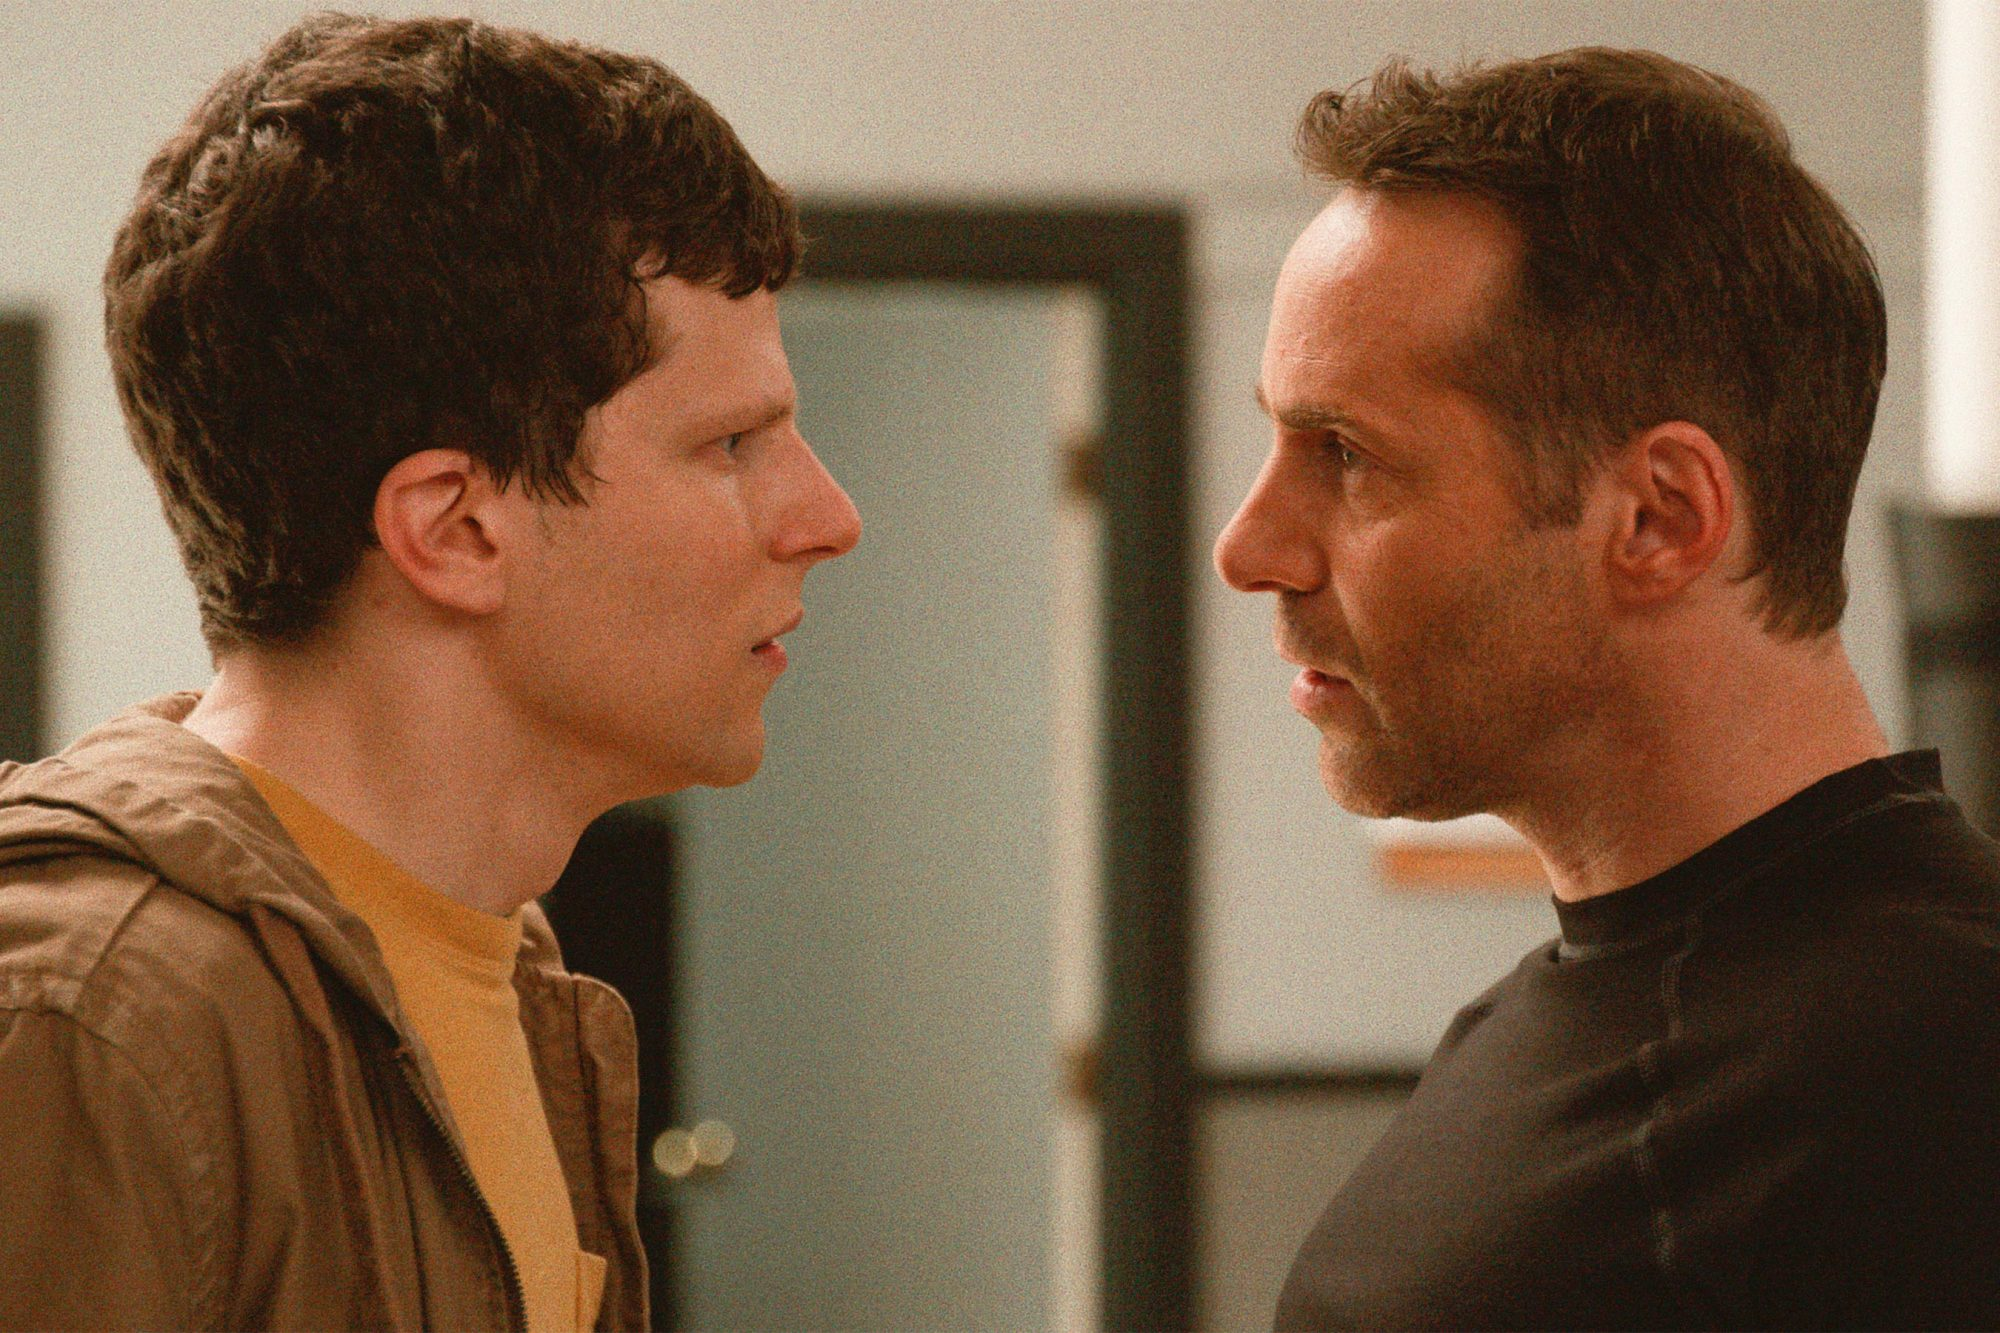 The Art of Self-Defense (2019) Jesse Eisenberg and Alessandro Nivola CR: Bleecker Street